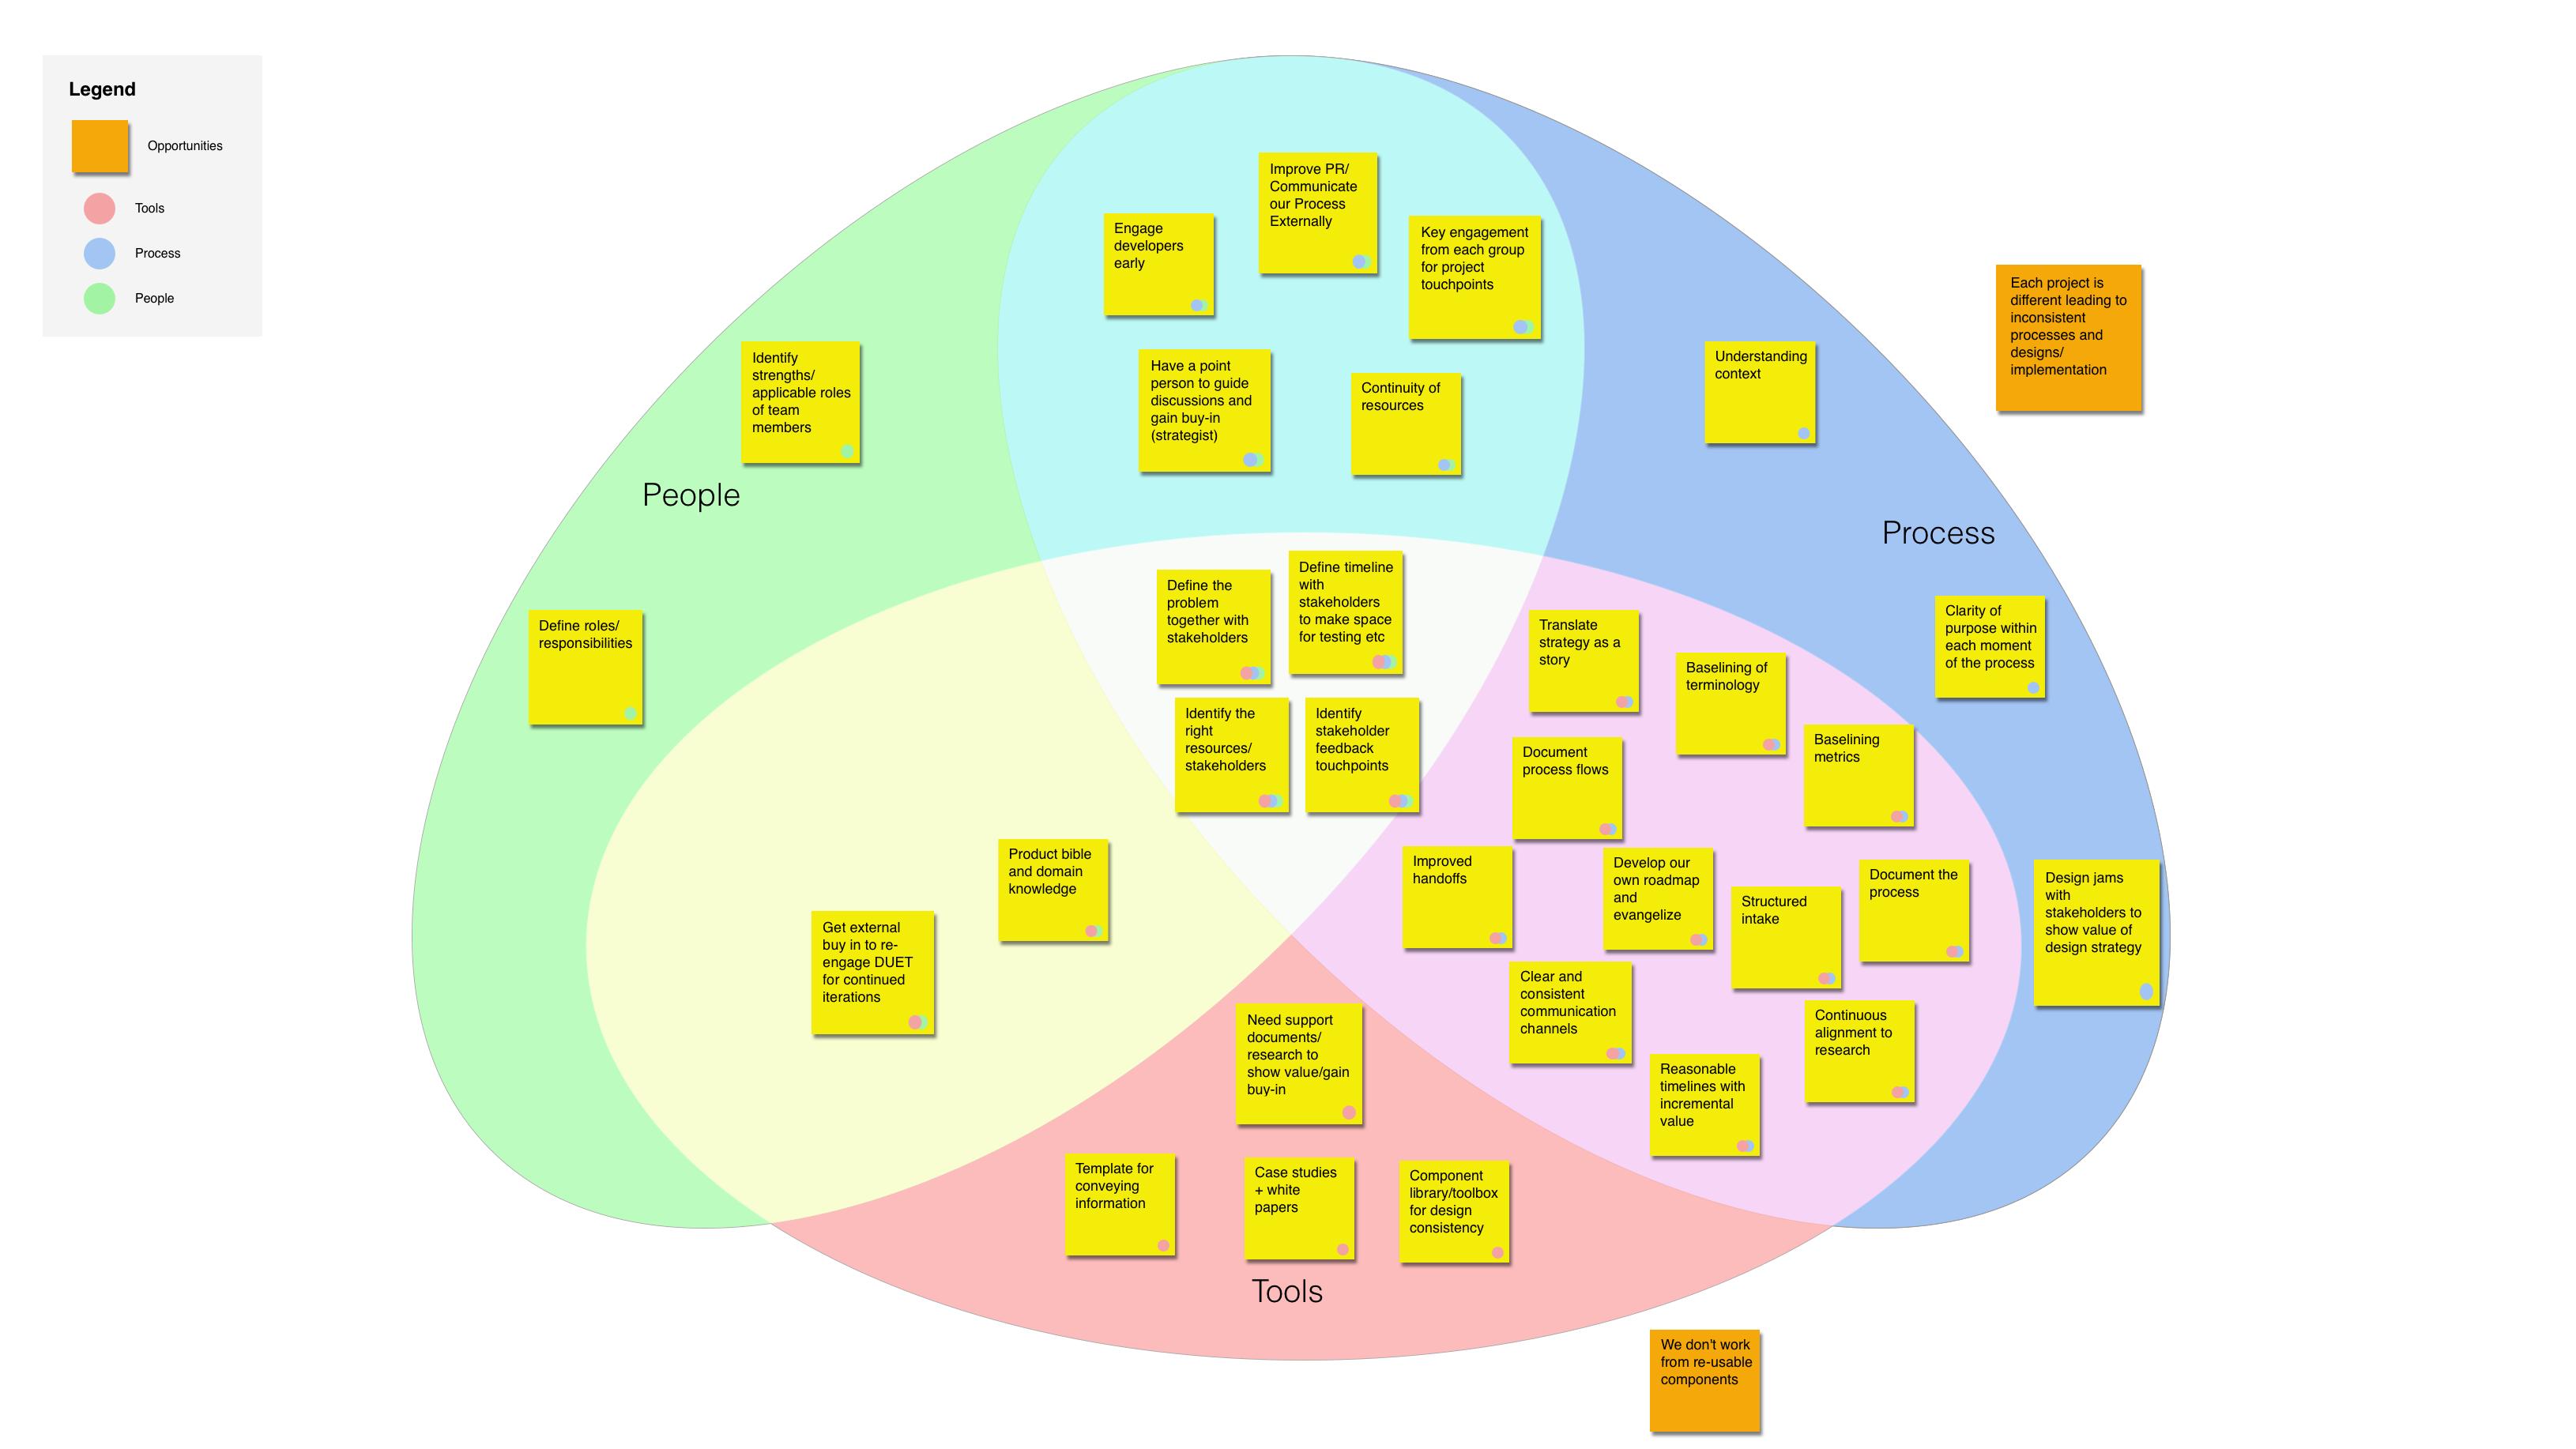 People, Process, Tools Venn Diagram